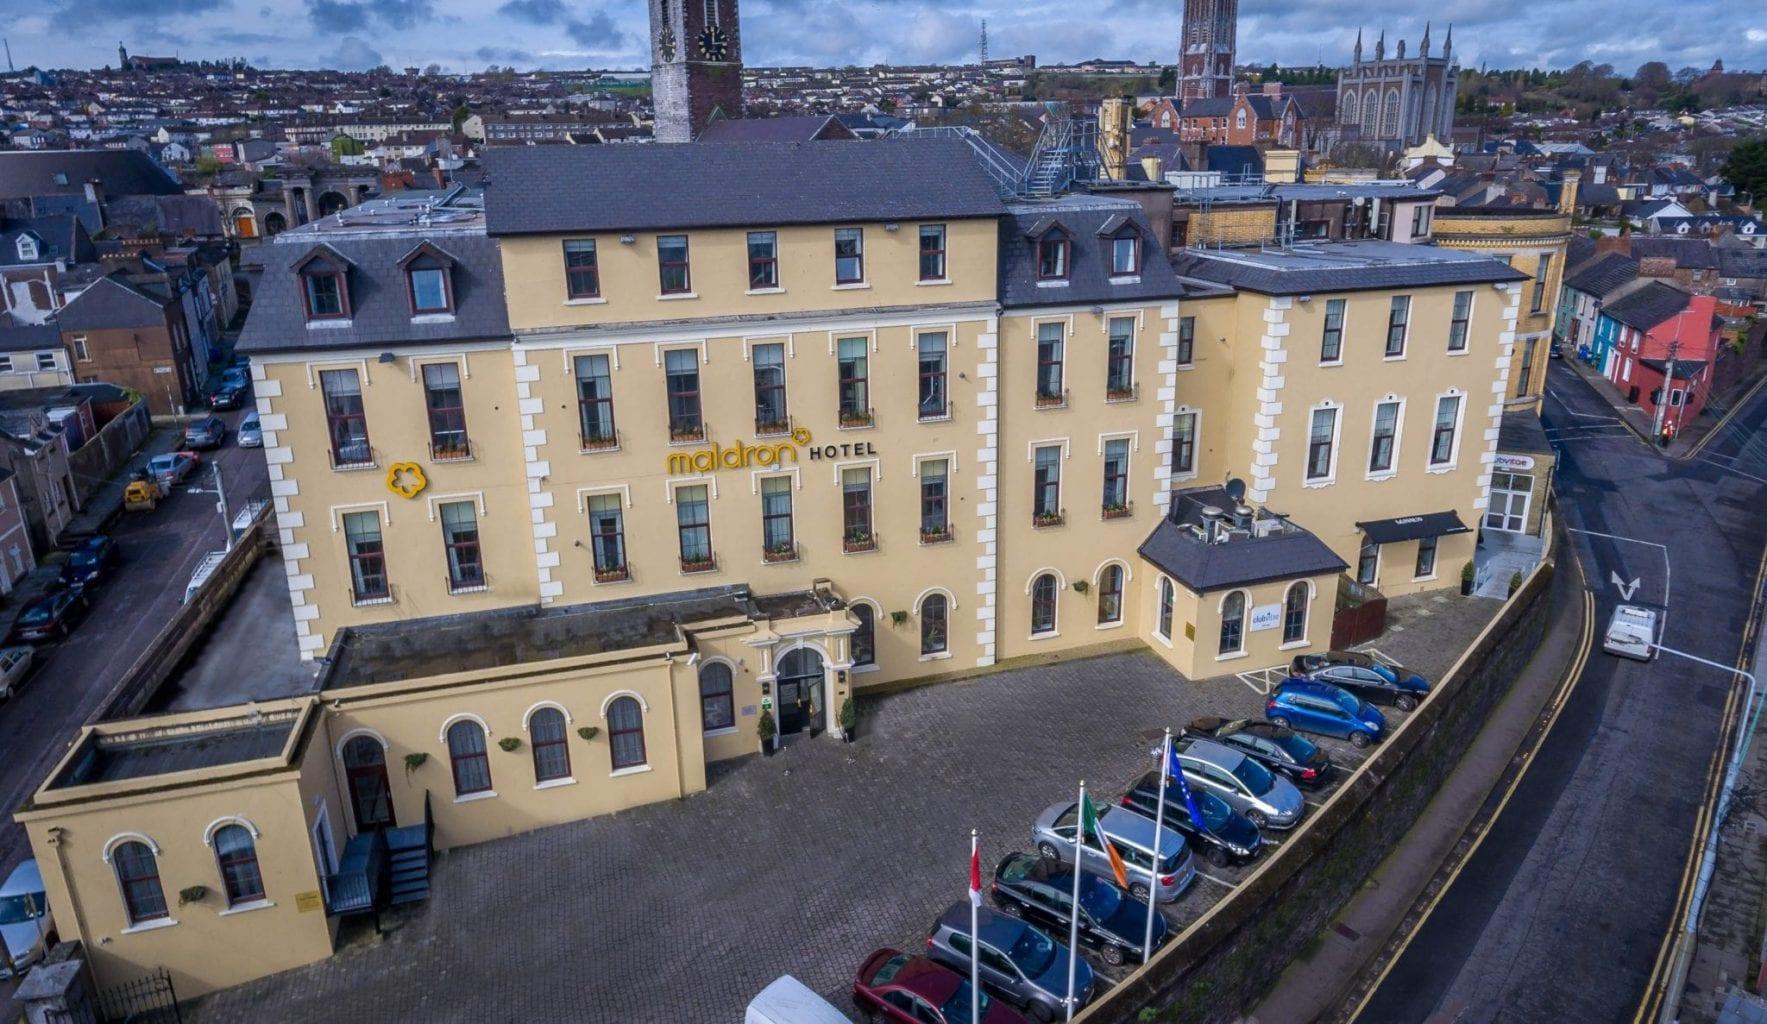 Maldron Hotel Cork (exterior)